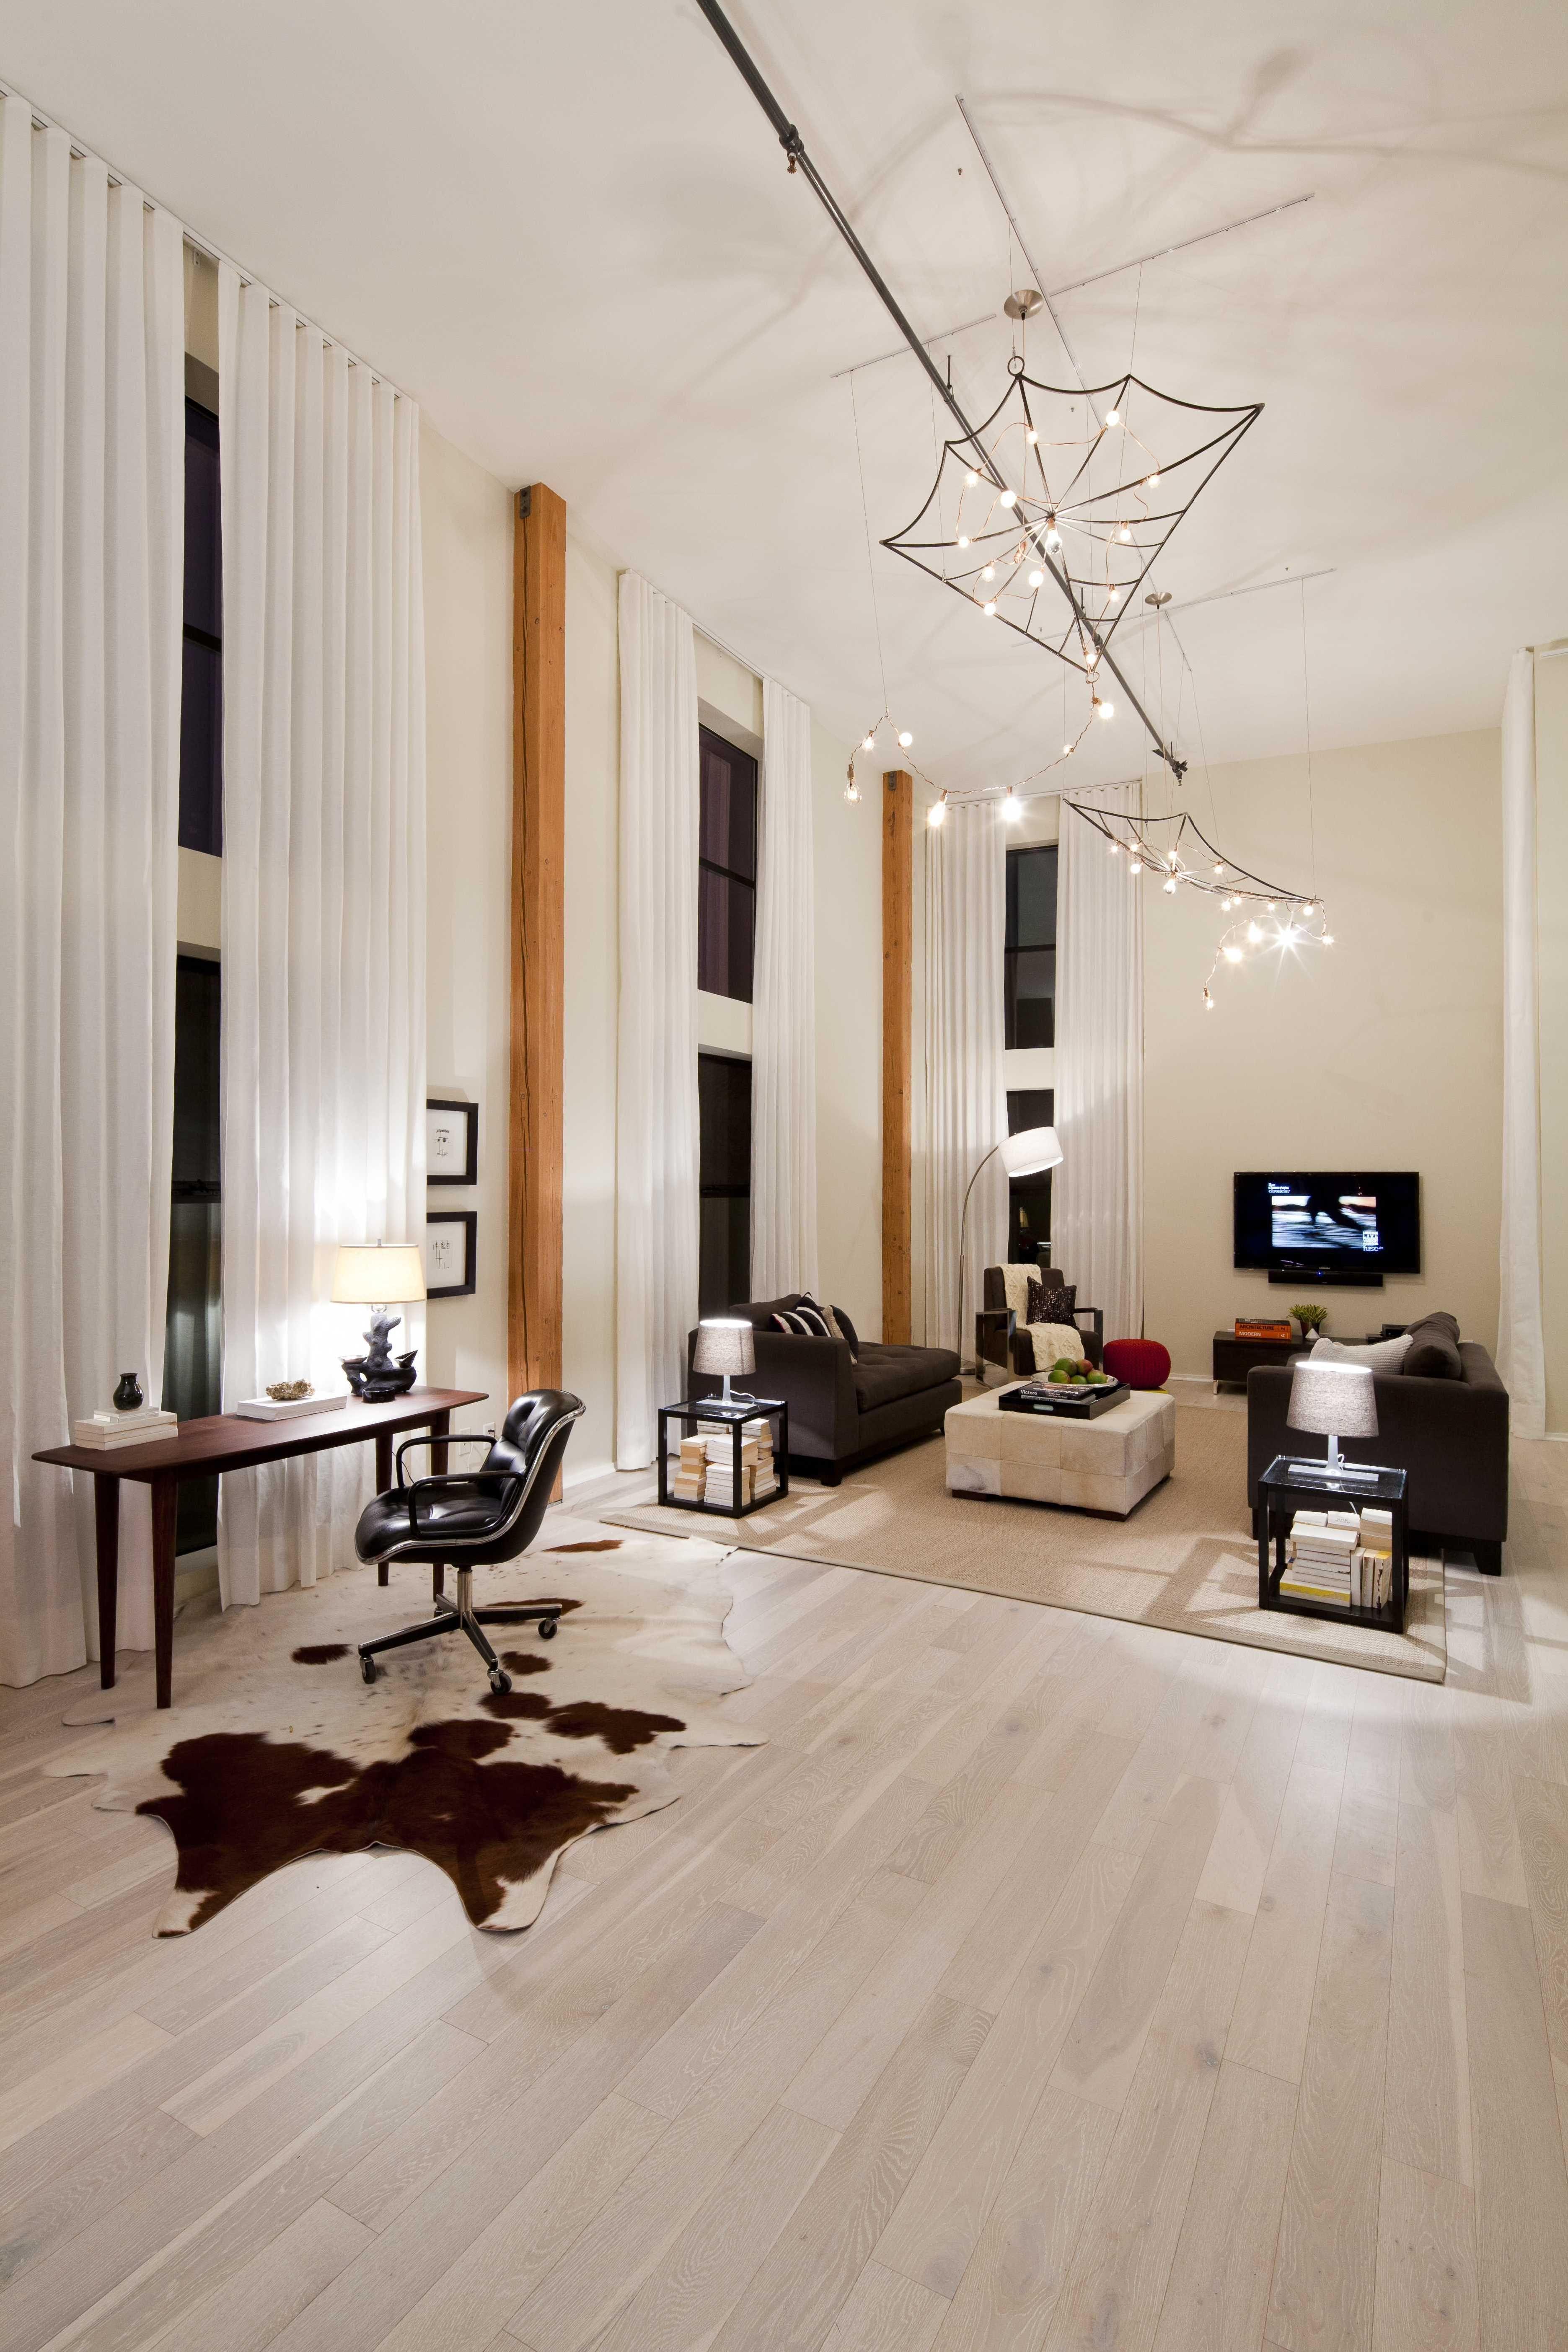 del rey loft - susan manrao design | venice beach loft design